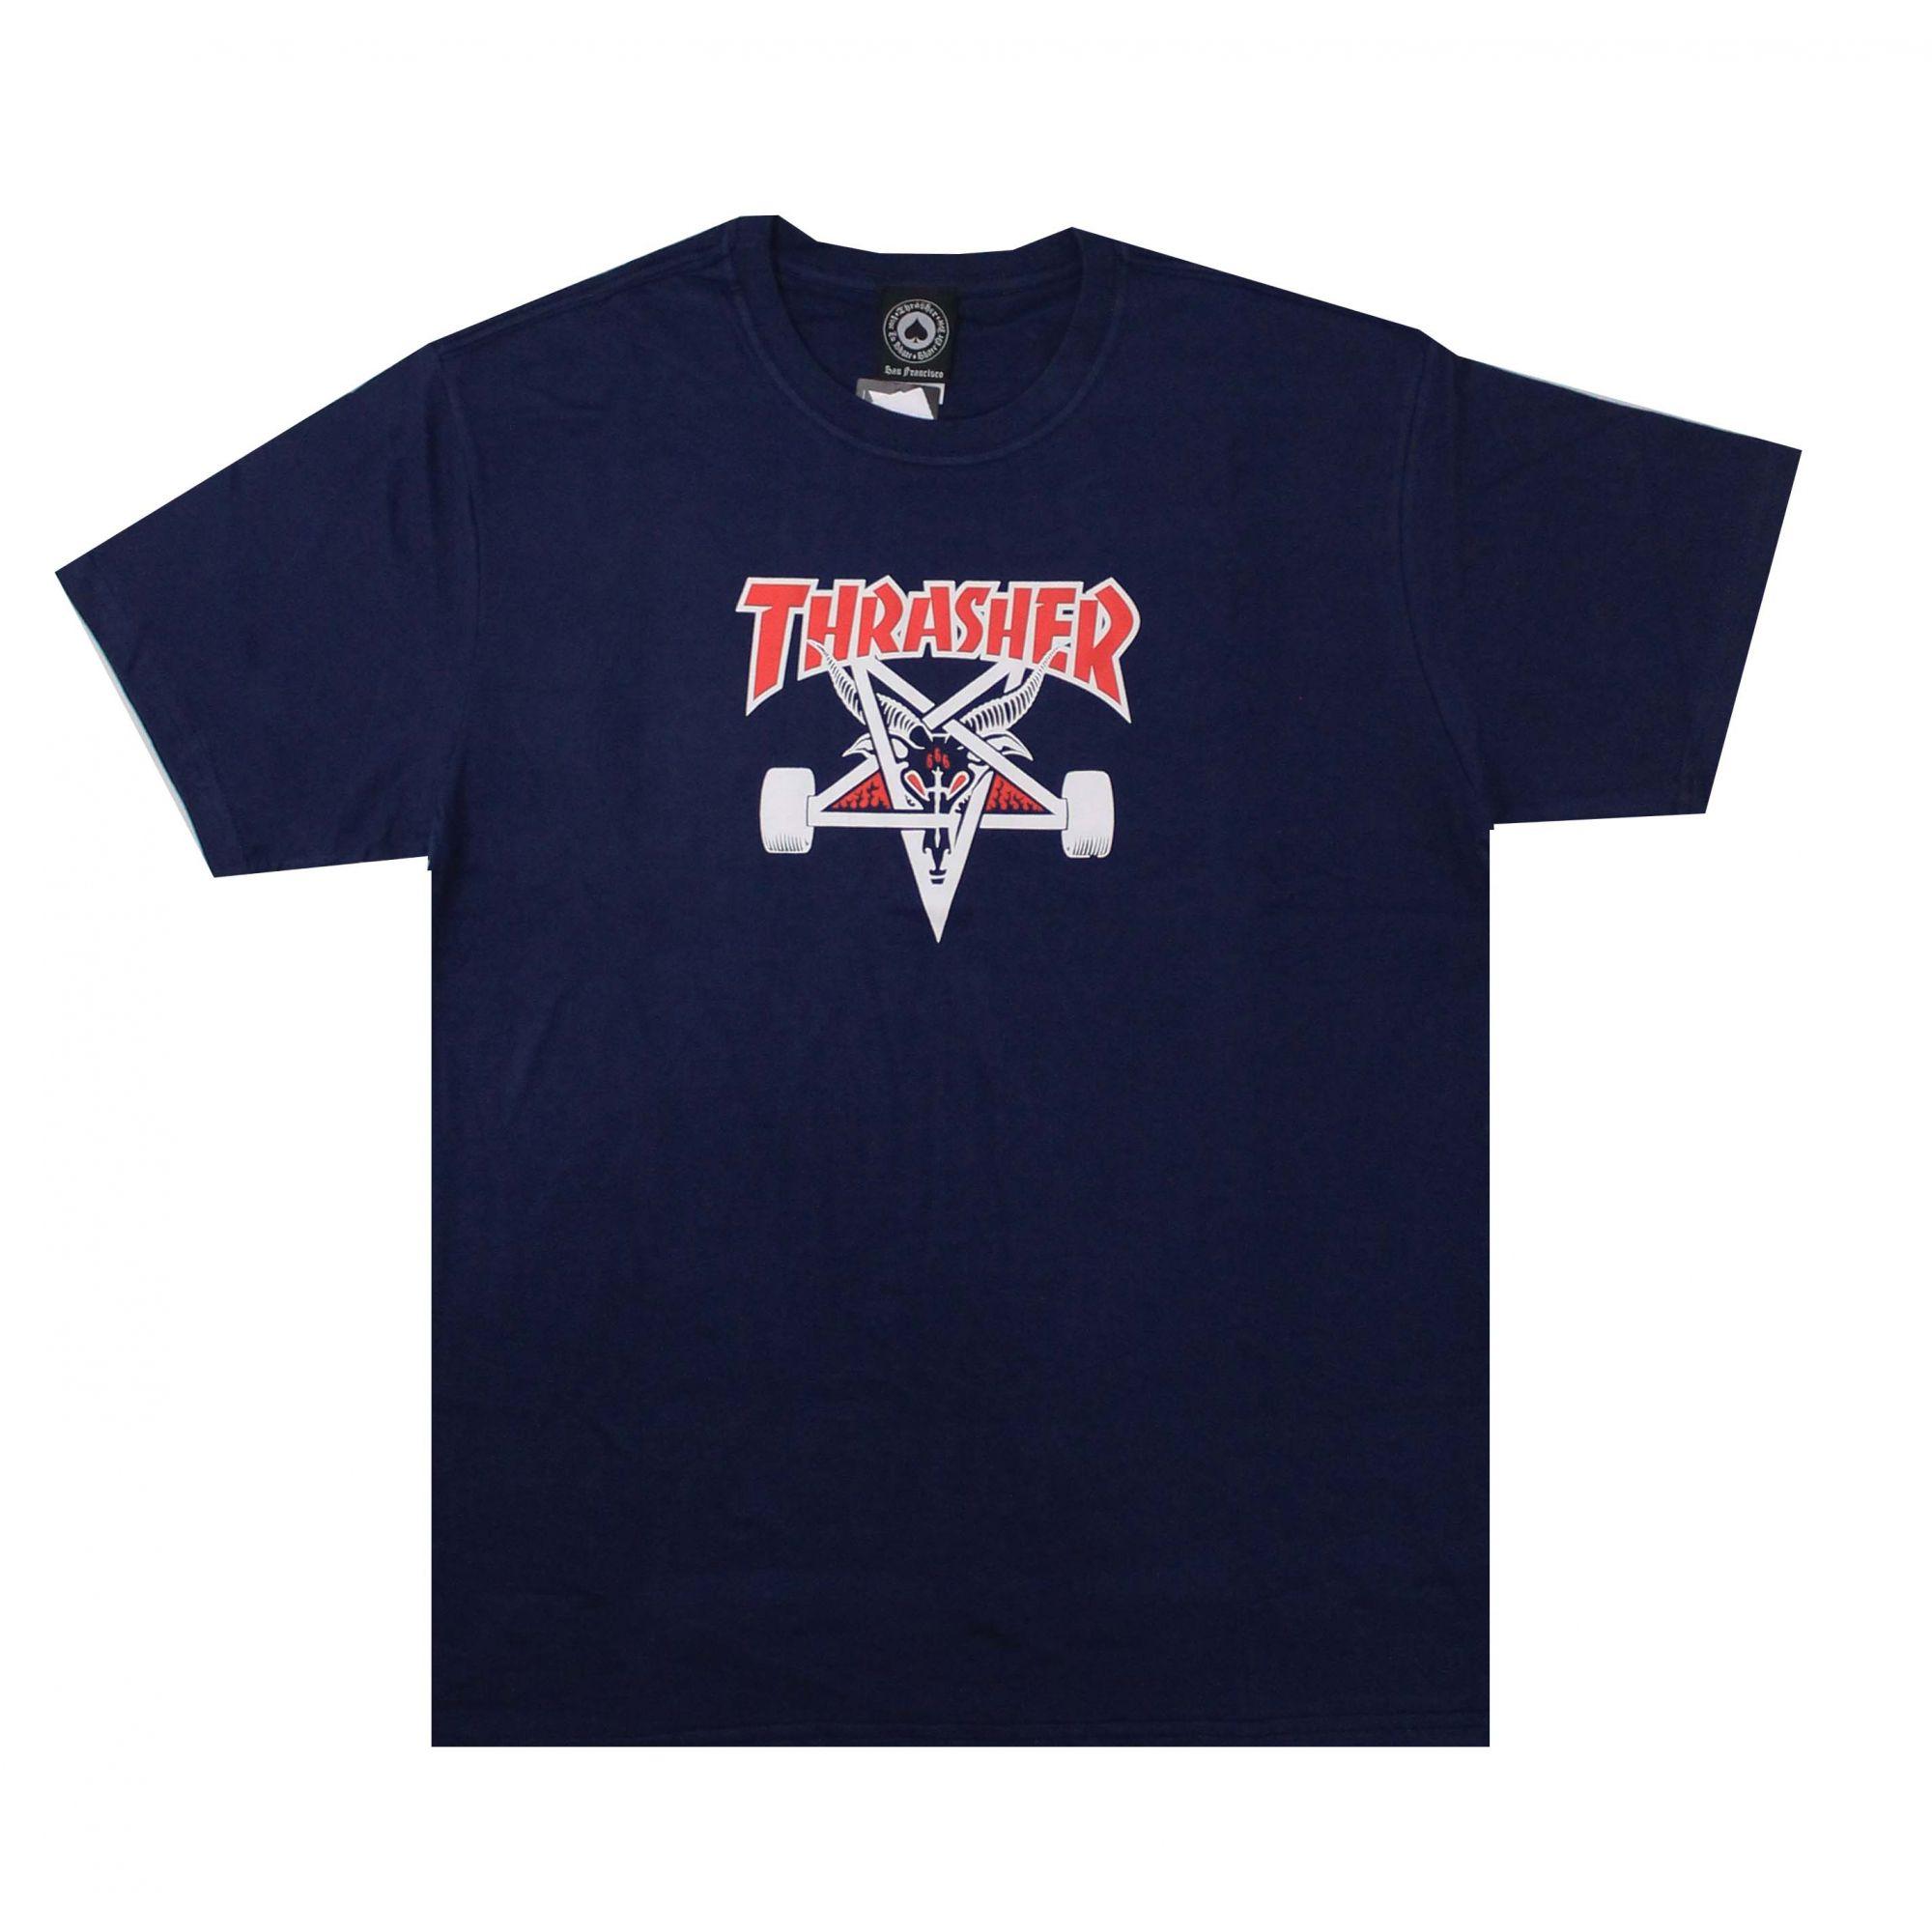 Camiseta Thrasher Magazine Two Tone Skate Goat - Azul Marinho